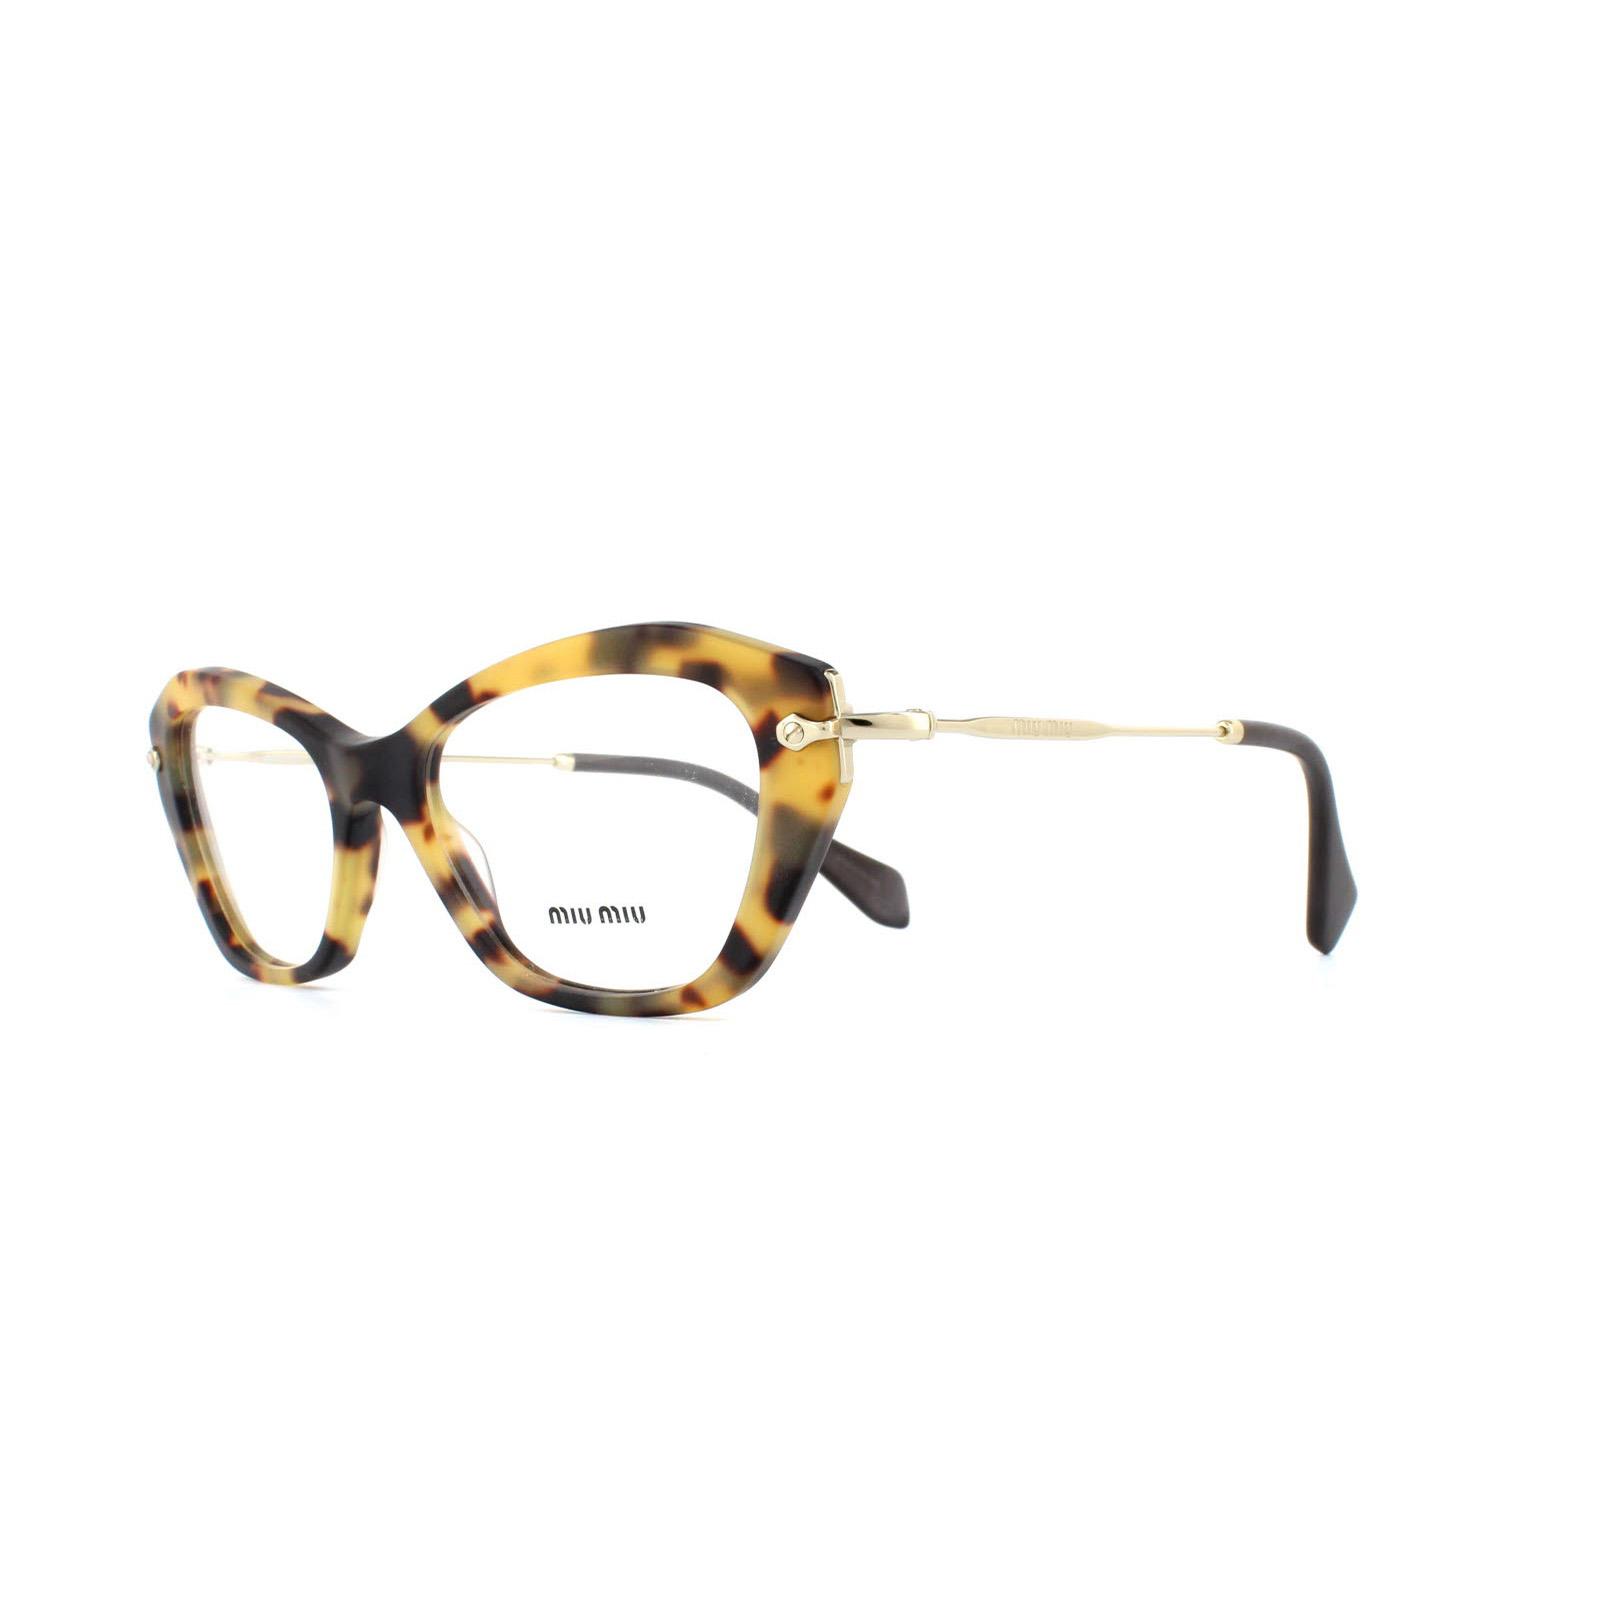 sentinel miu miu glasses frames 04lv han1o1 sand light havana womens 52mm - Miu Miu Glasses Frames